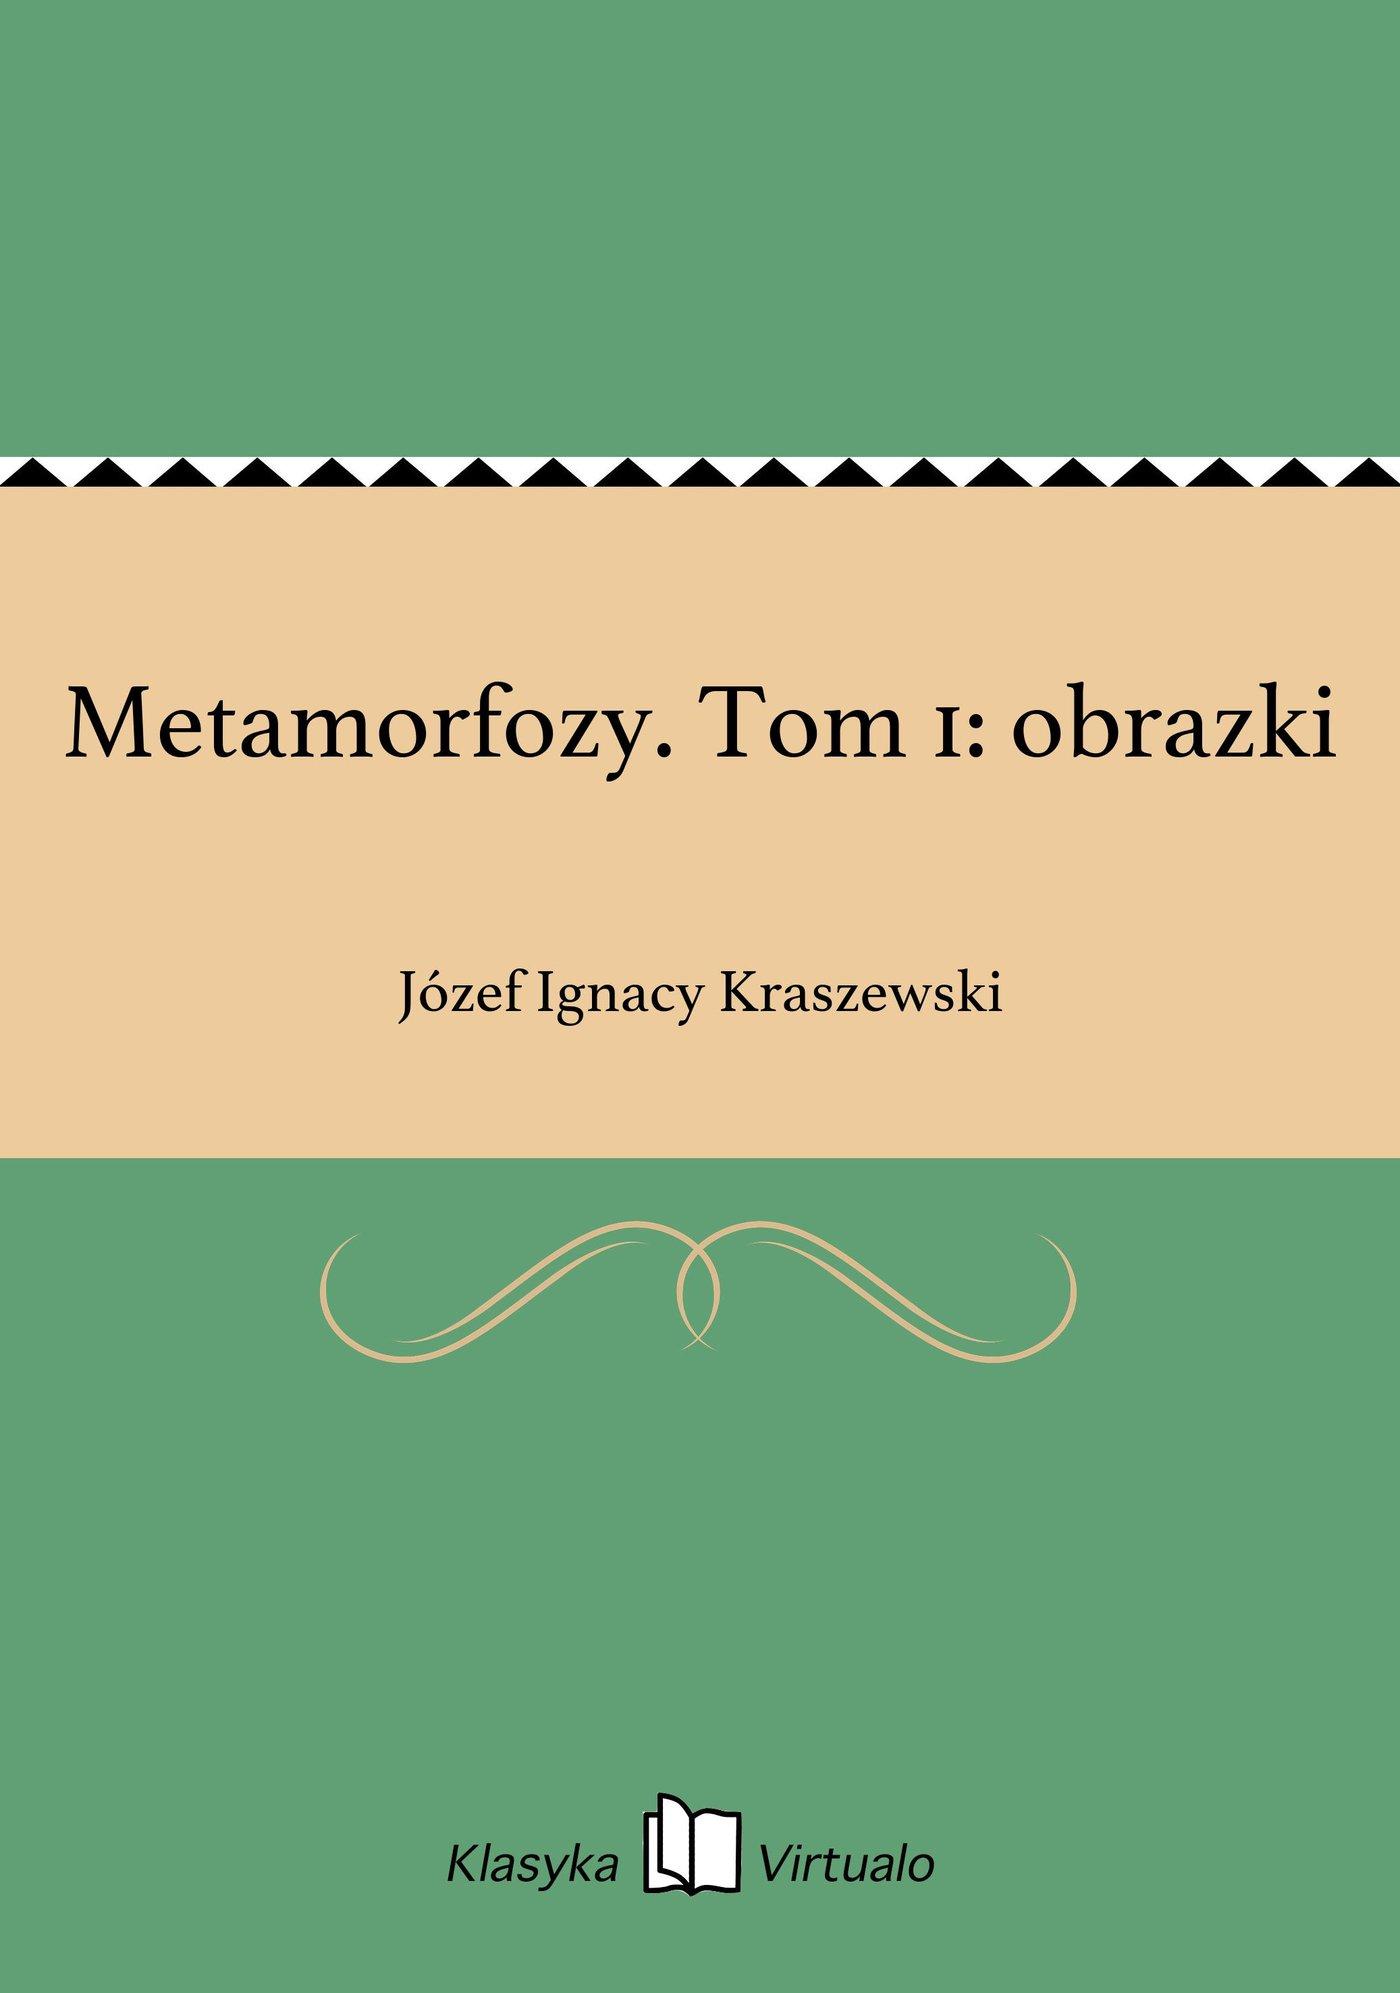 Metamorfozy. Tom 1: obrazki - Ebook (Książka na Kindle) do pobrania w formacie MOBI